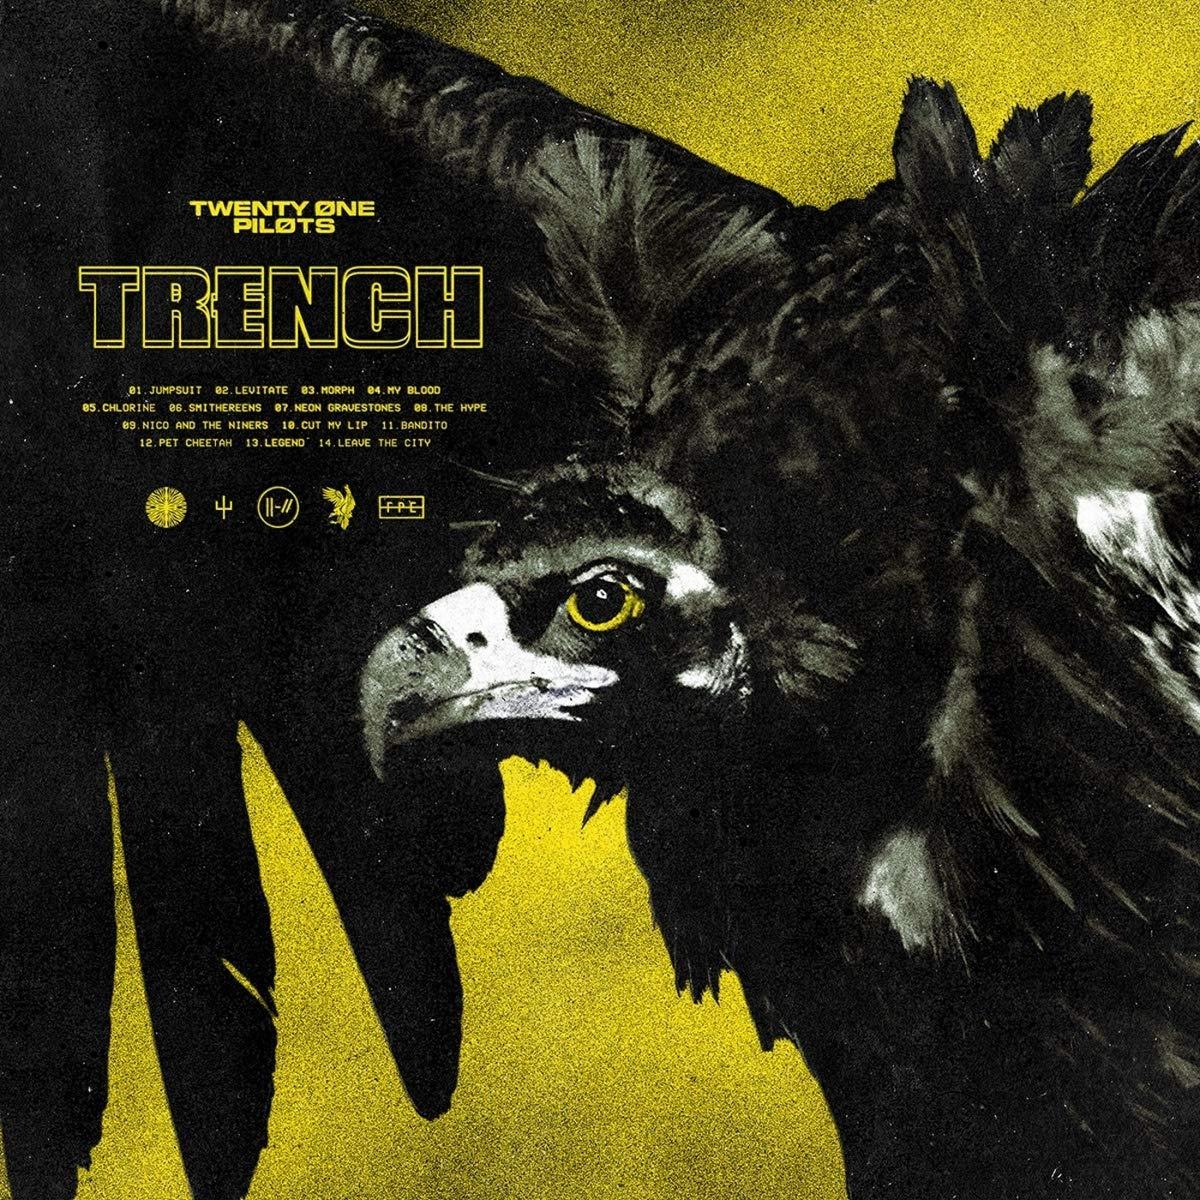 Cassette : Twenty One Pilots - Trench (Cassette)